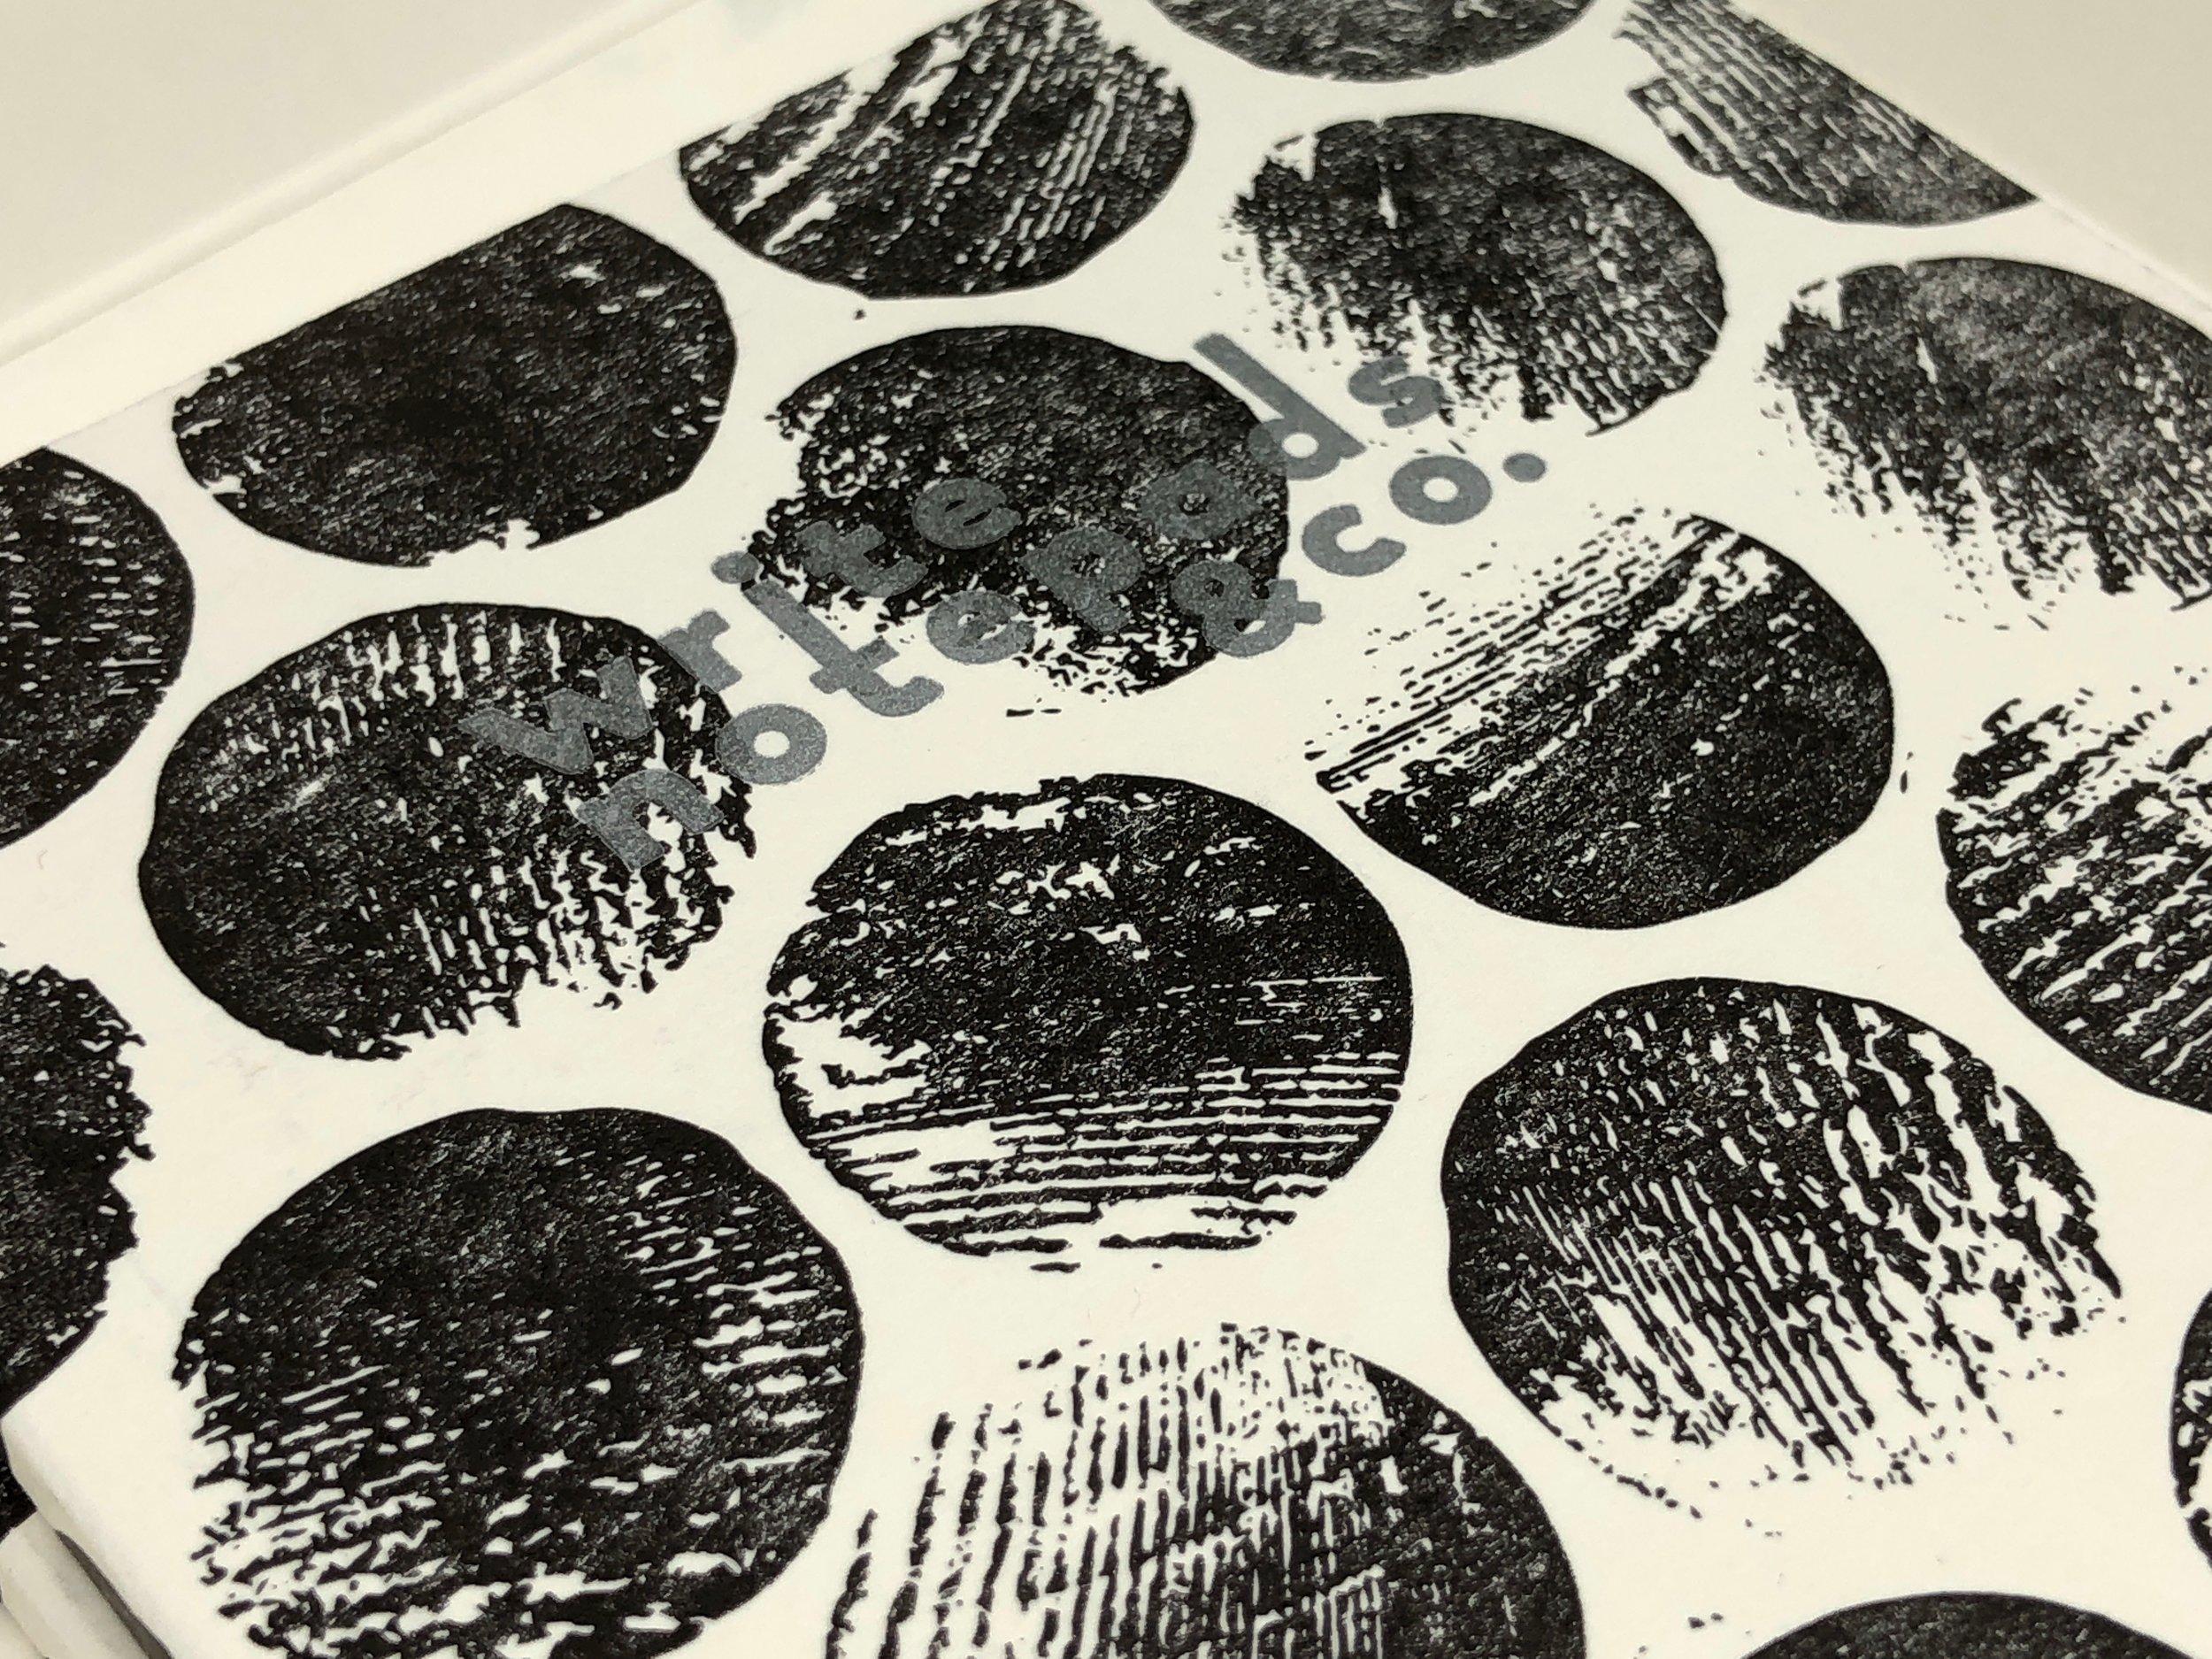 write-notepads-fingerprint-5.jpg